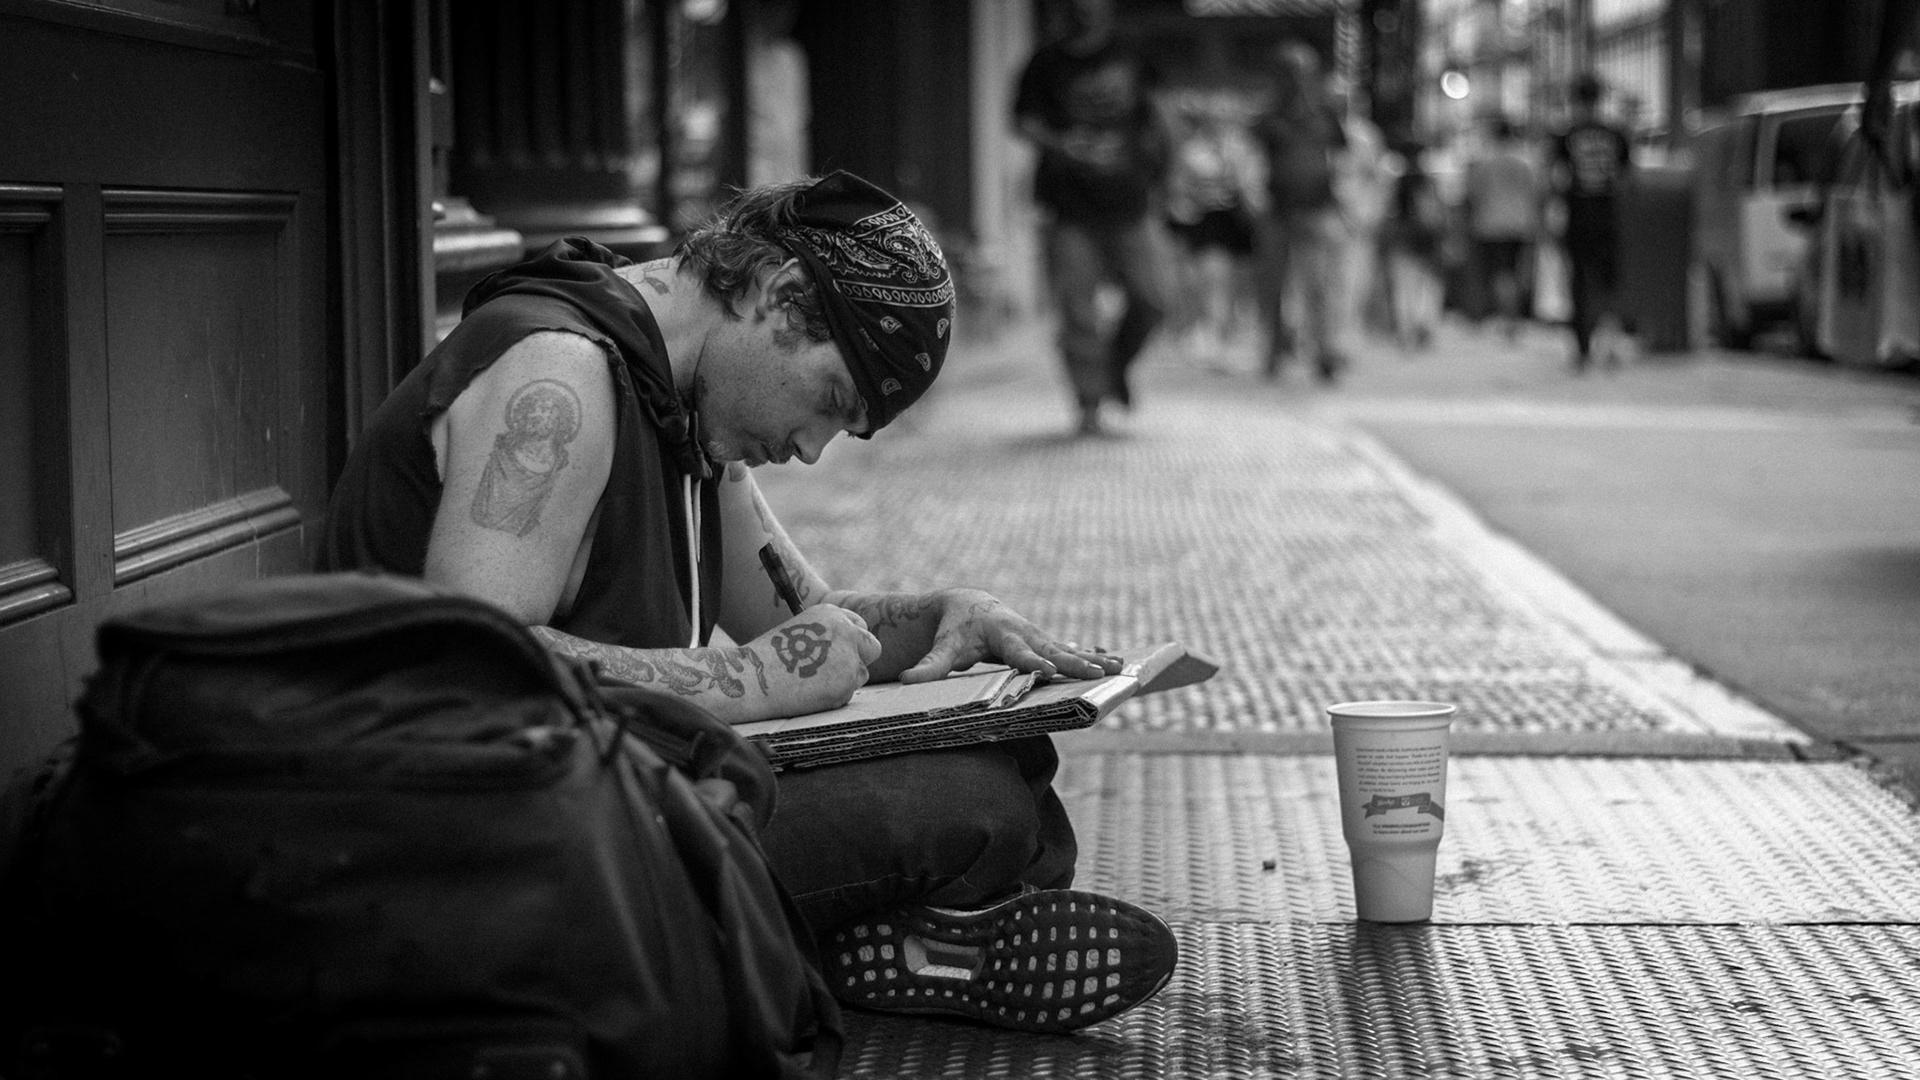 Manuel Dieguez Ny2016 Street Photography